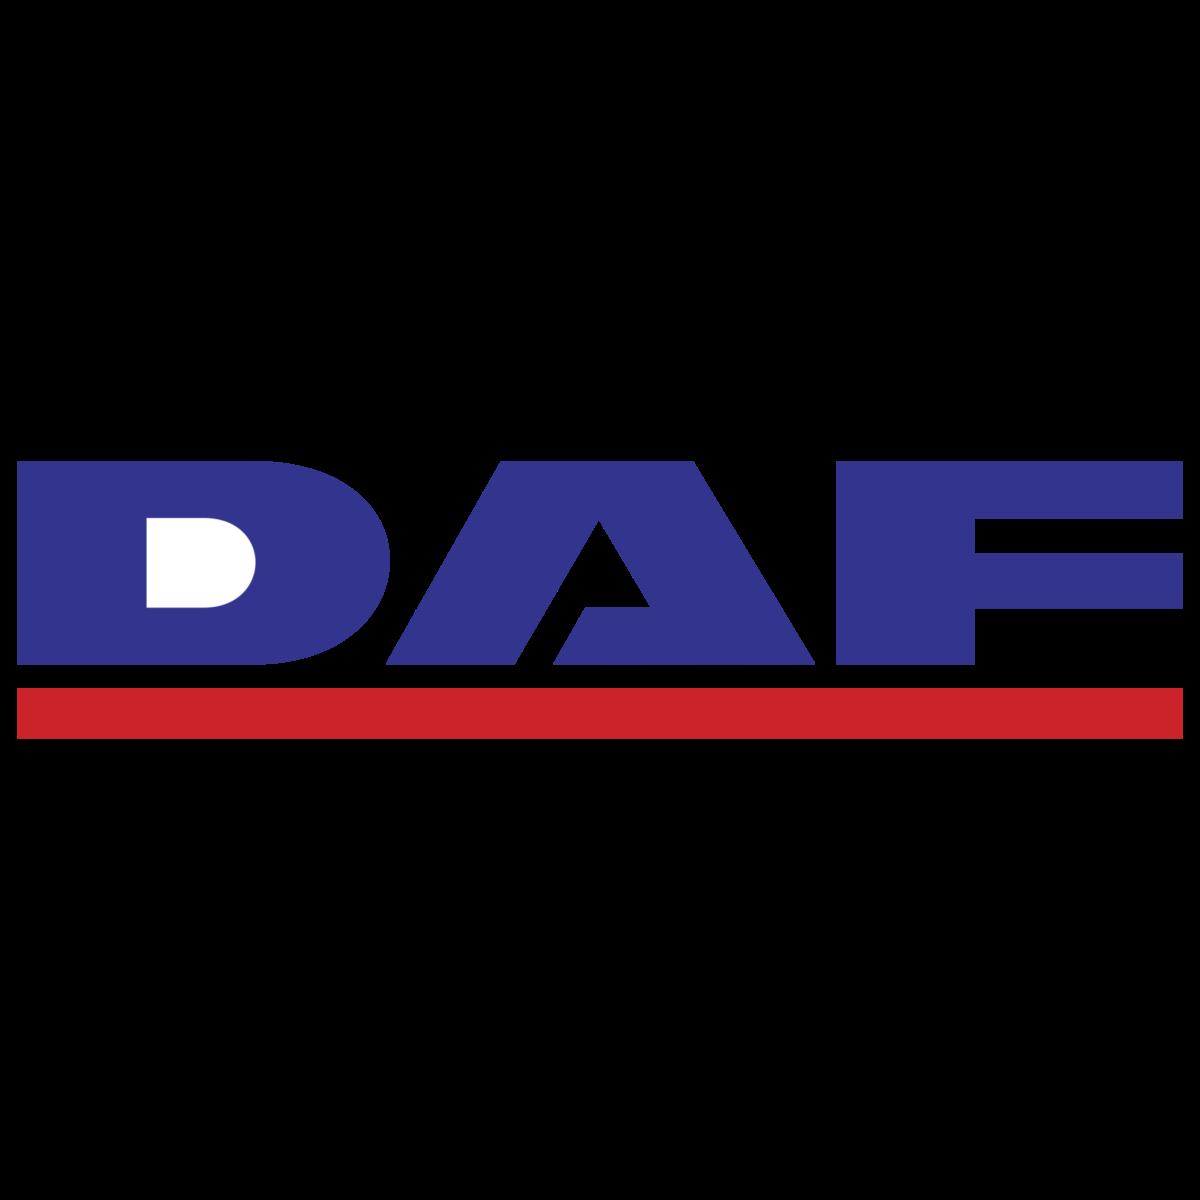 daf-logo-png.png